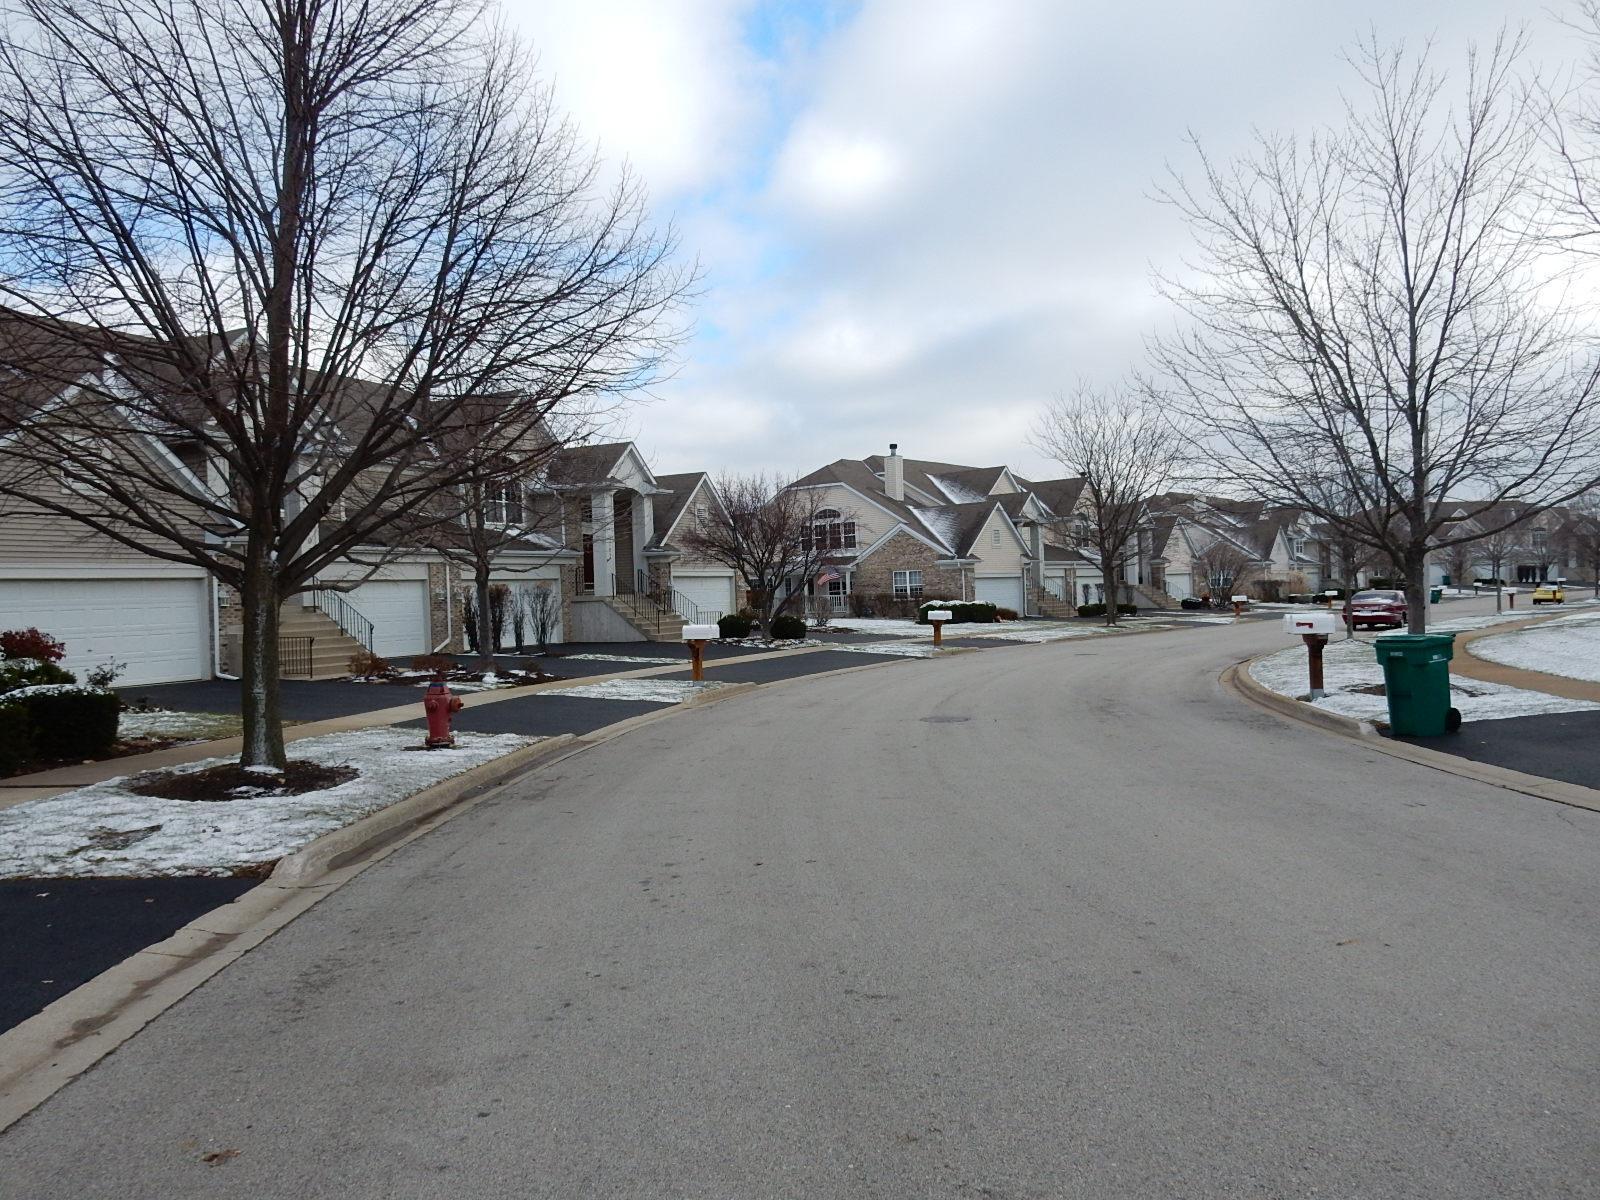 2647 Old Woods Trl, Plainfield, IL 60586